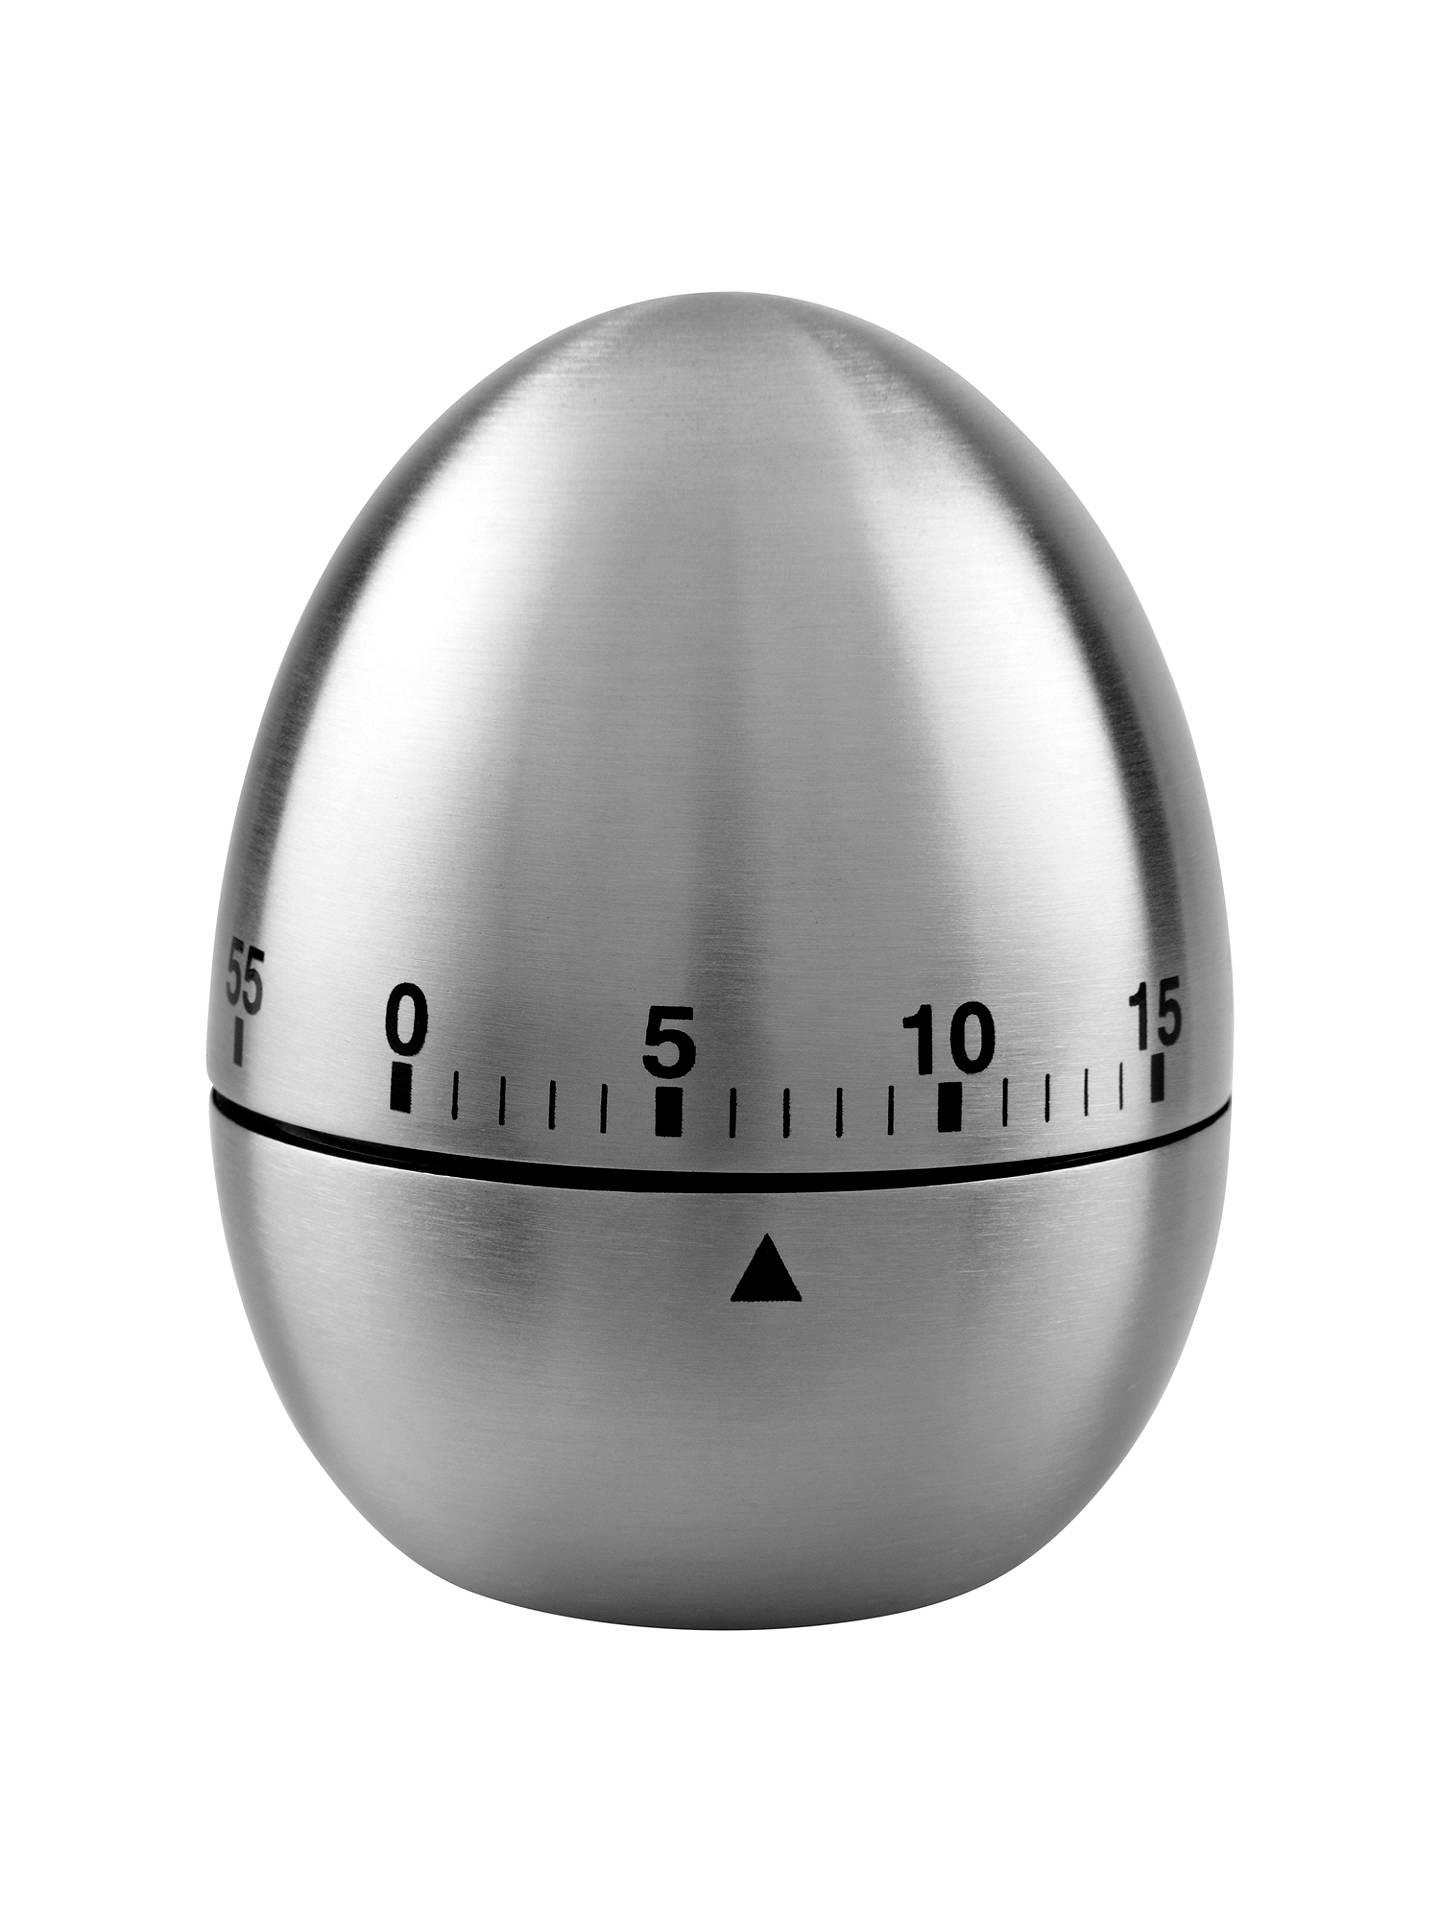 Stainless Steel Kitchen Egg Timer